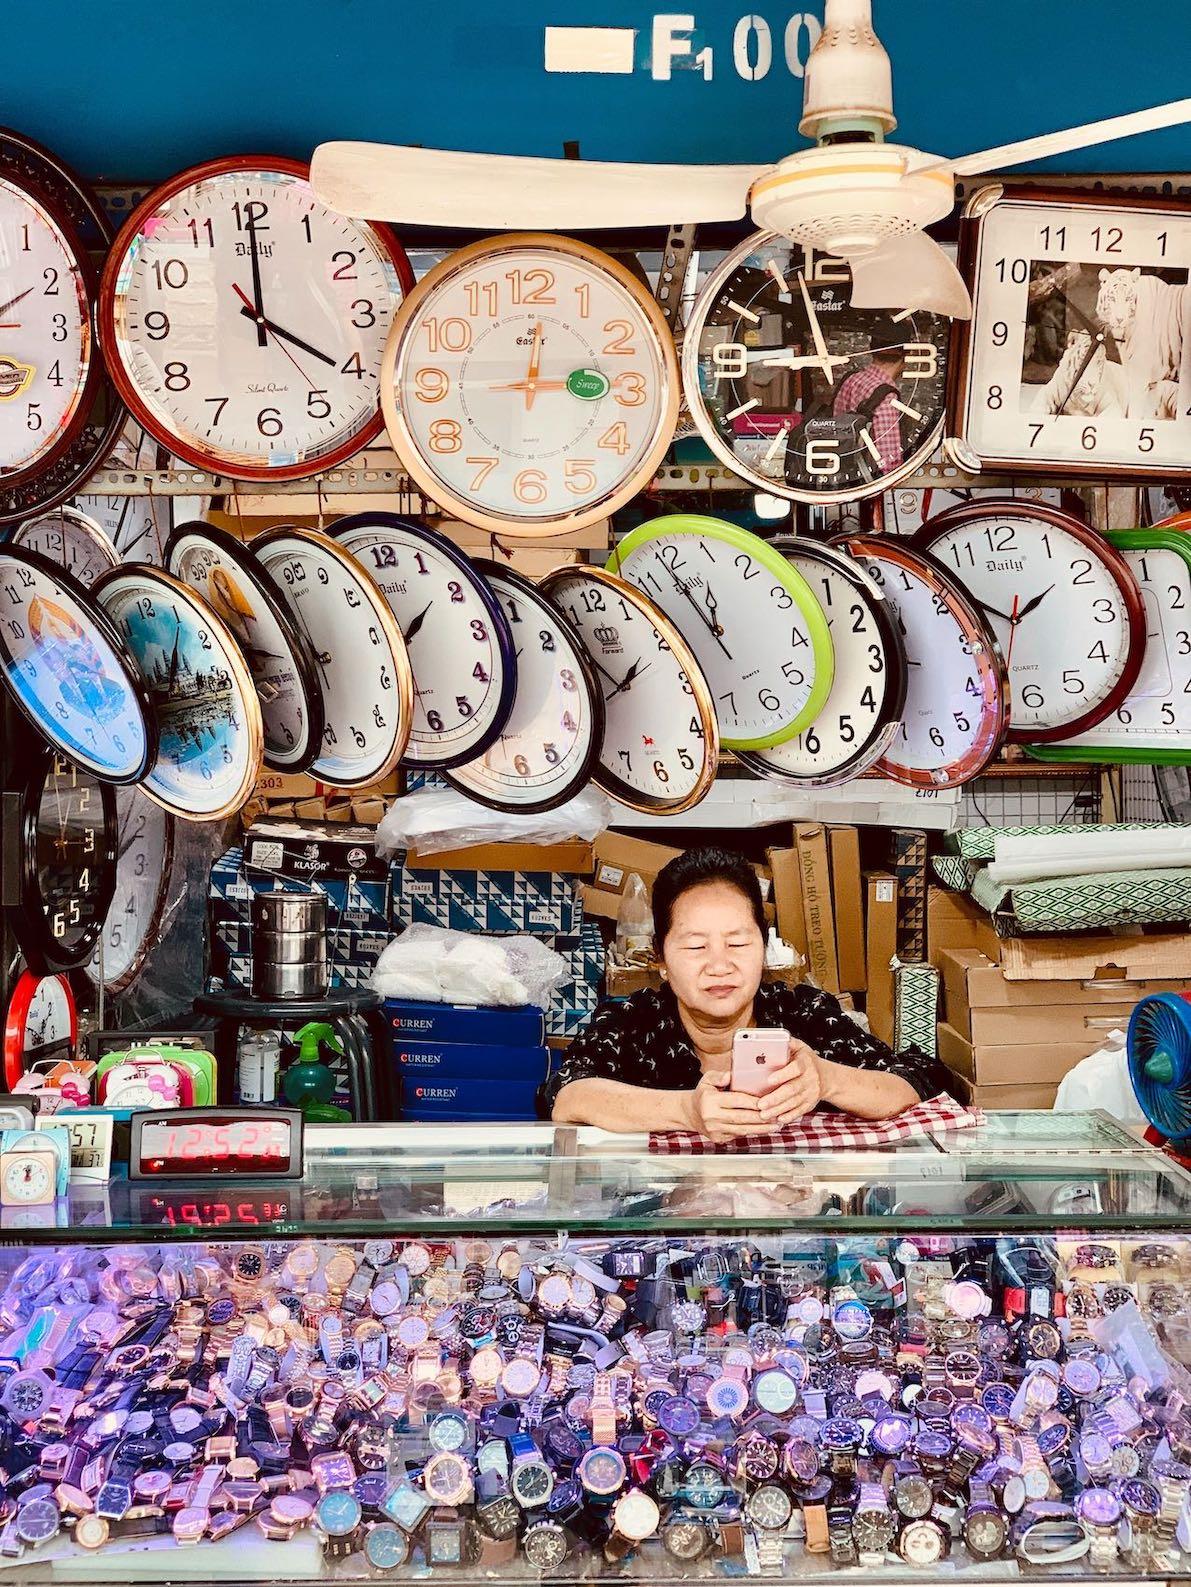 Cheap clocks and watches Phnom Penh Cambodia